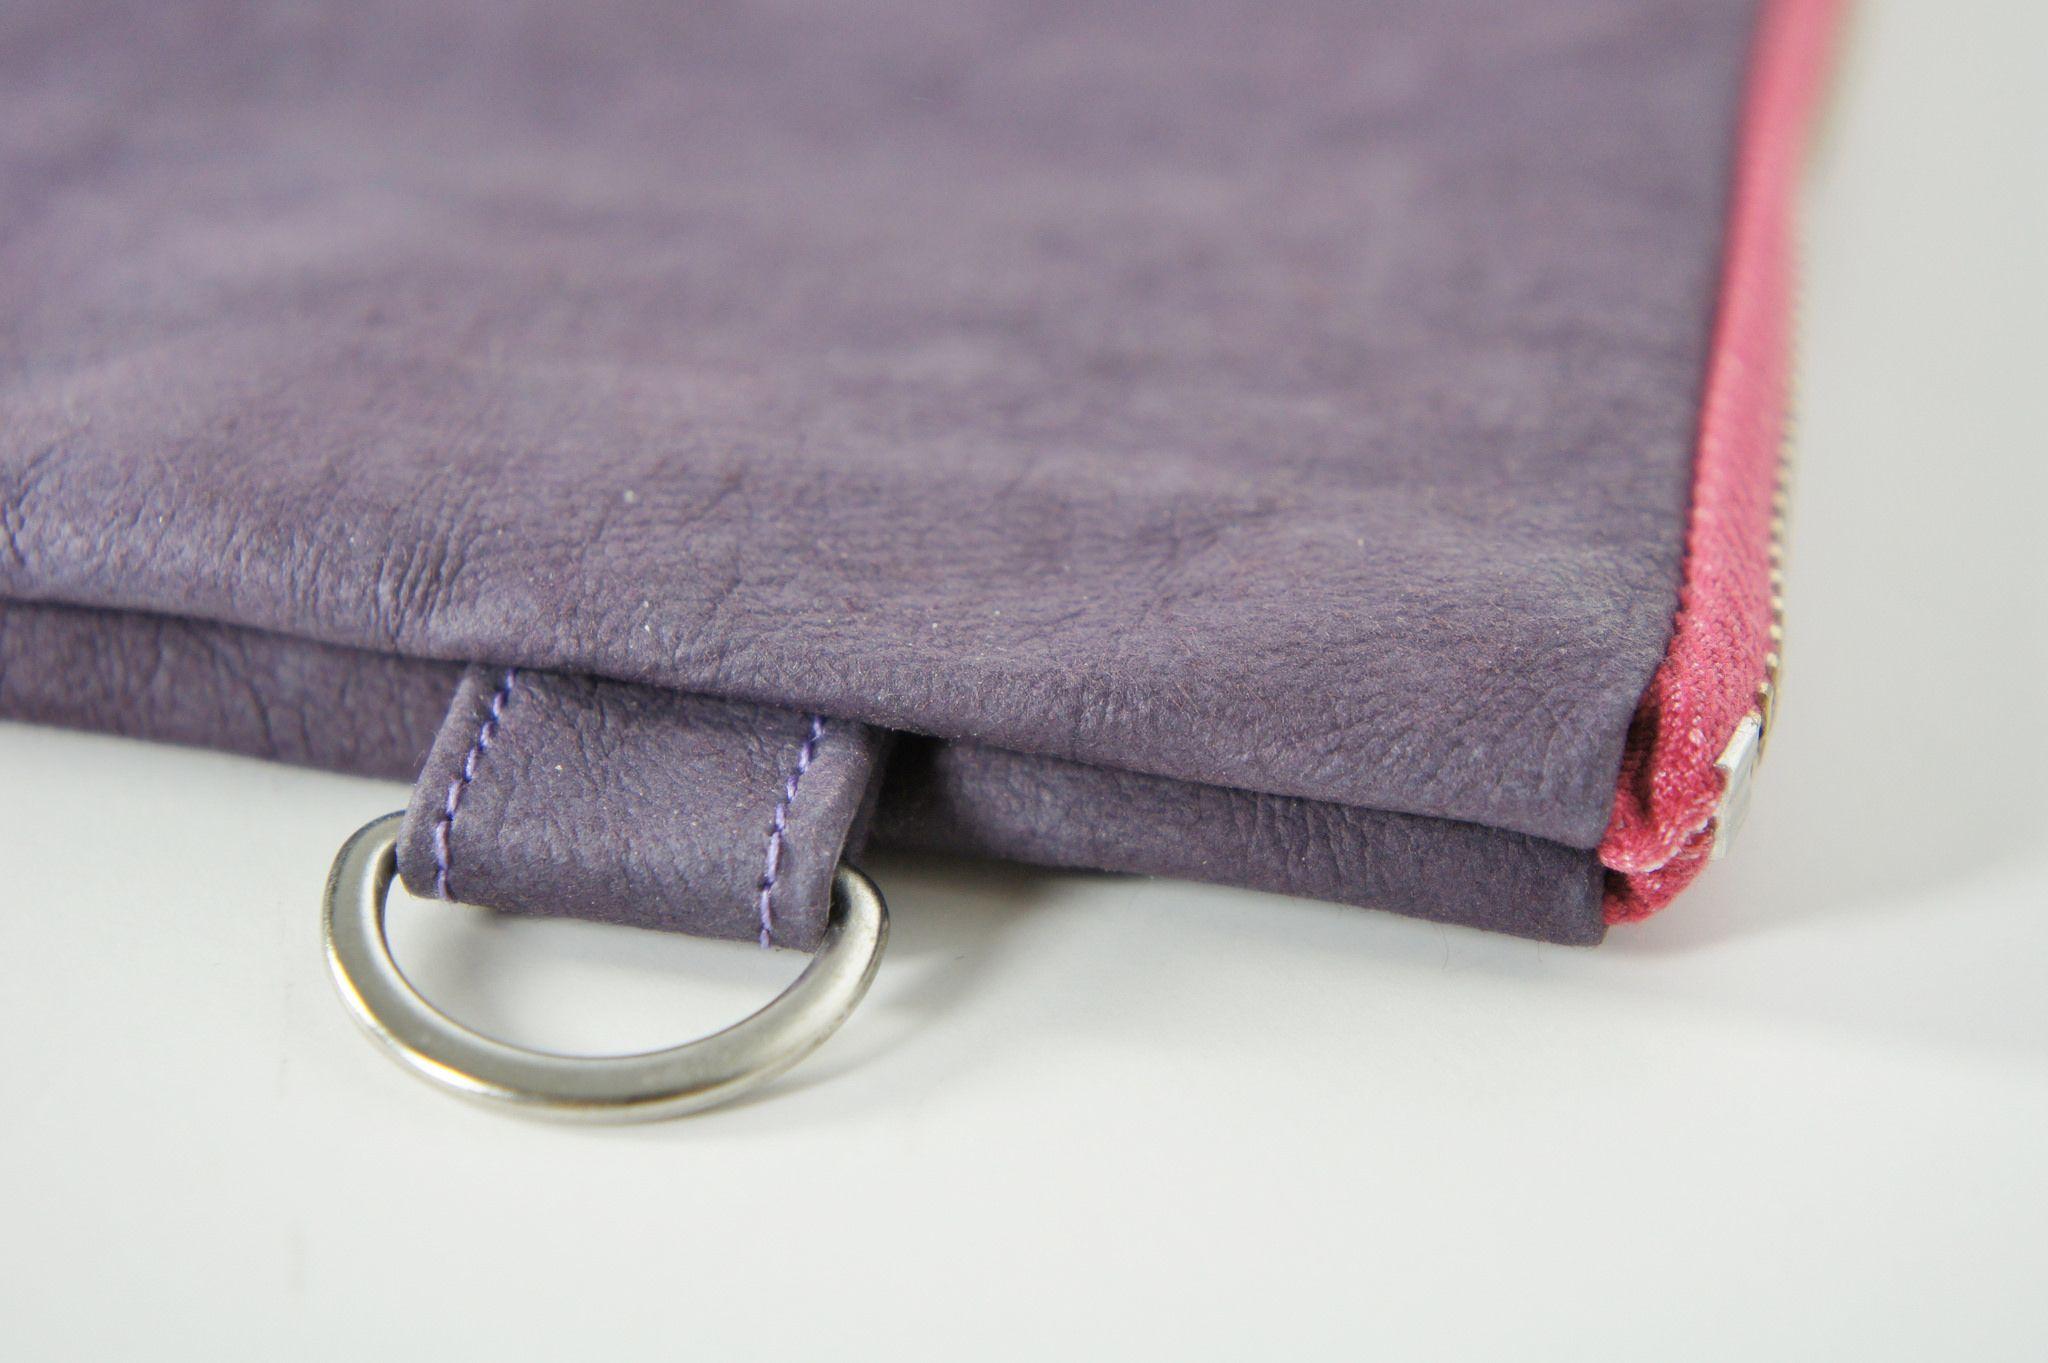 "https://flic.kr/p/vjdWh5 | SOAKcouture Kraft paper fabric clutch | SONY <a href=""http://www.SOAKcouture.etsy.comSC"" rel=""nofollow"">www.SOAKcouture.etsy.comSC</a>      D-Ring detail, YKK Zipper"